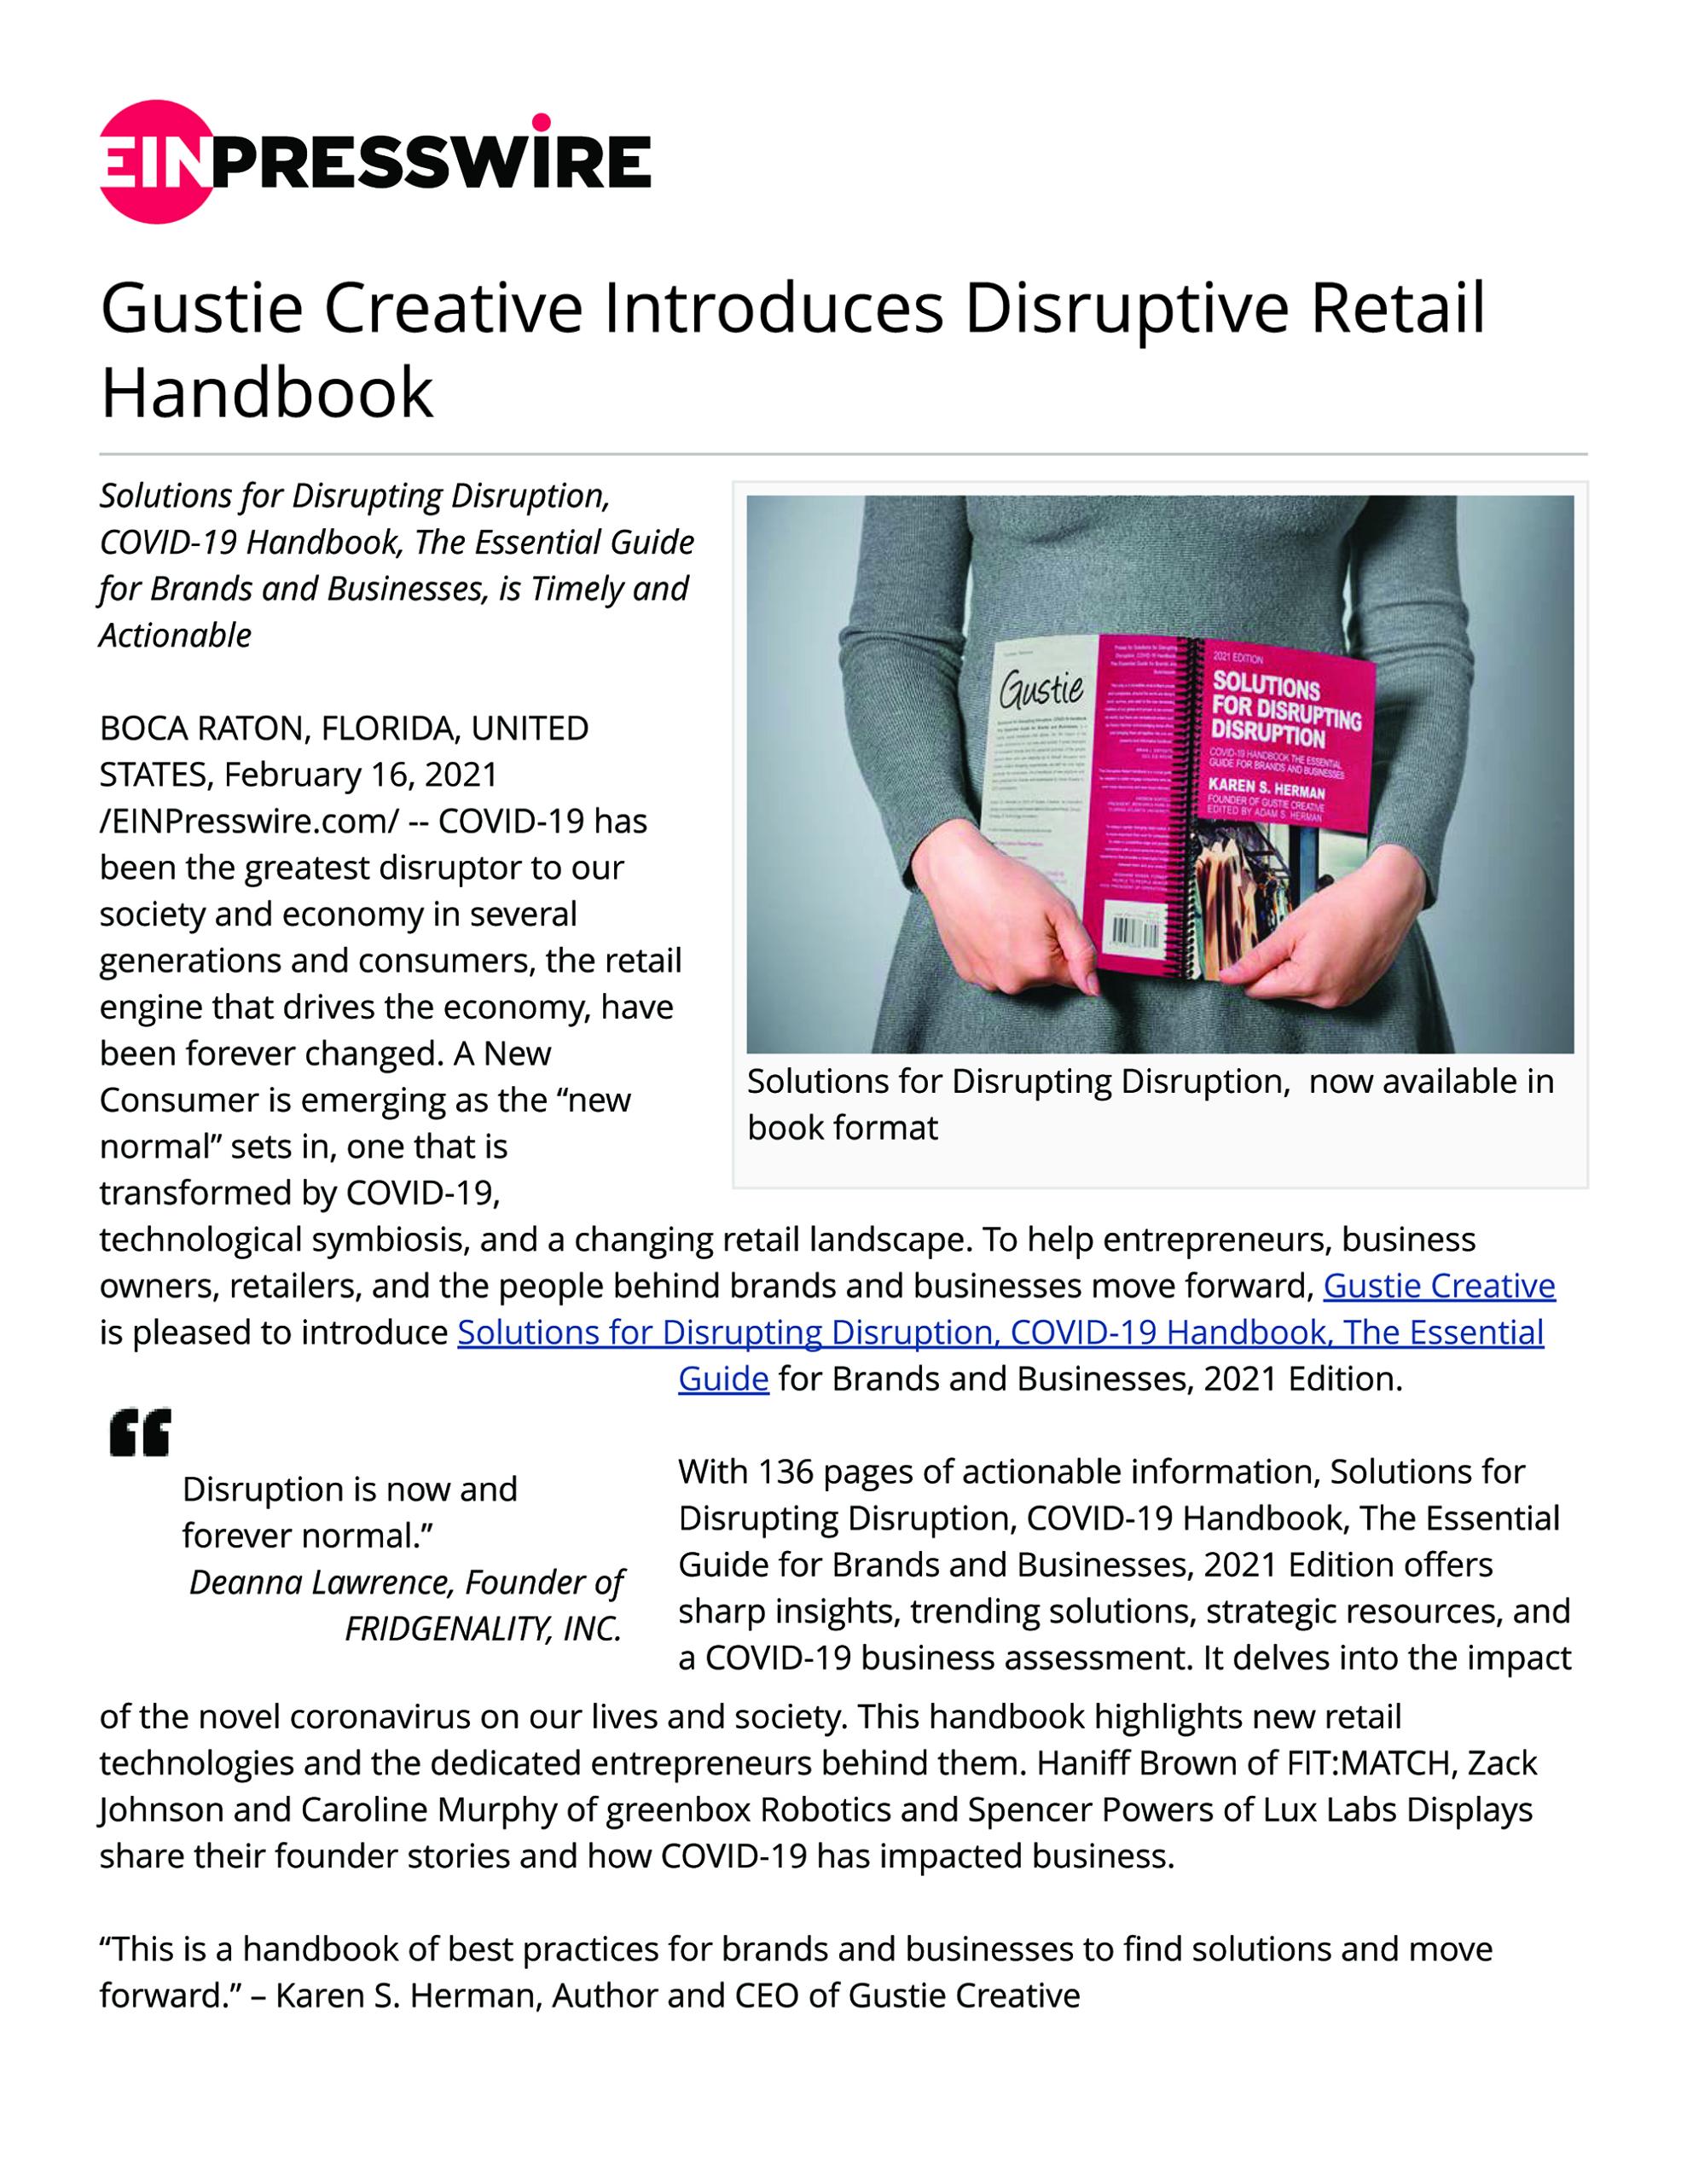 Gustie Creative Introduces Disruptive Retail Handbook